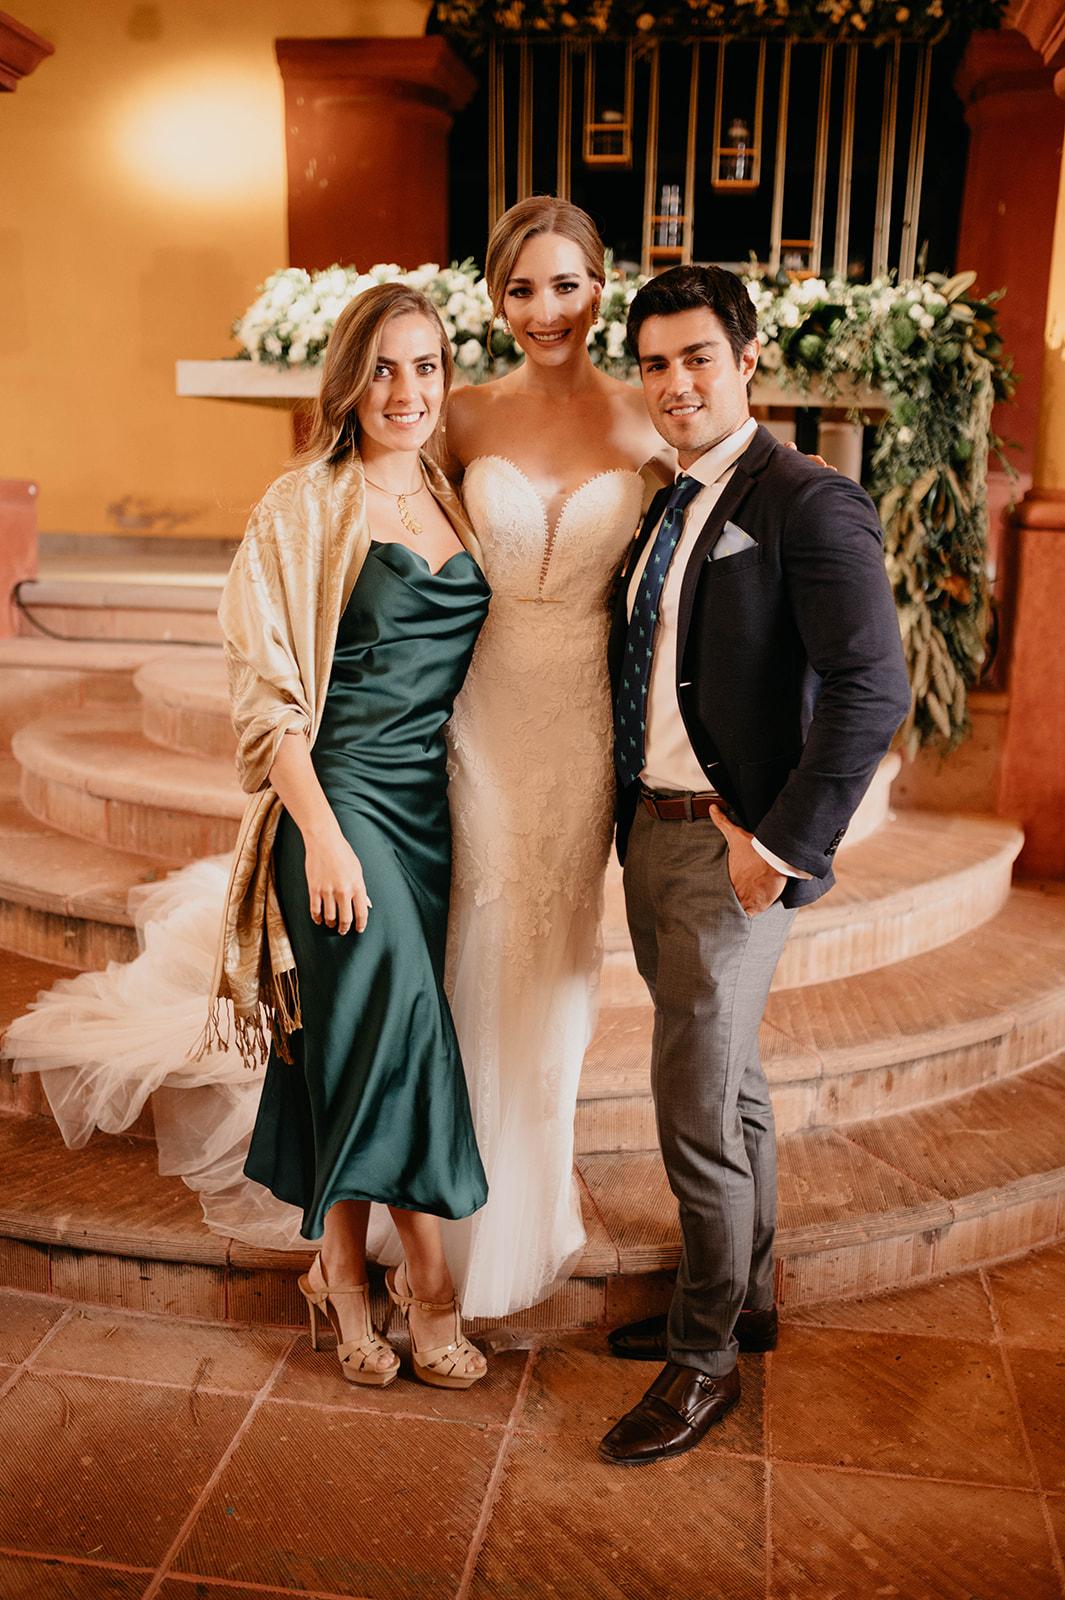 Mayte y Andrés